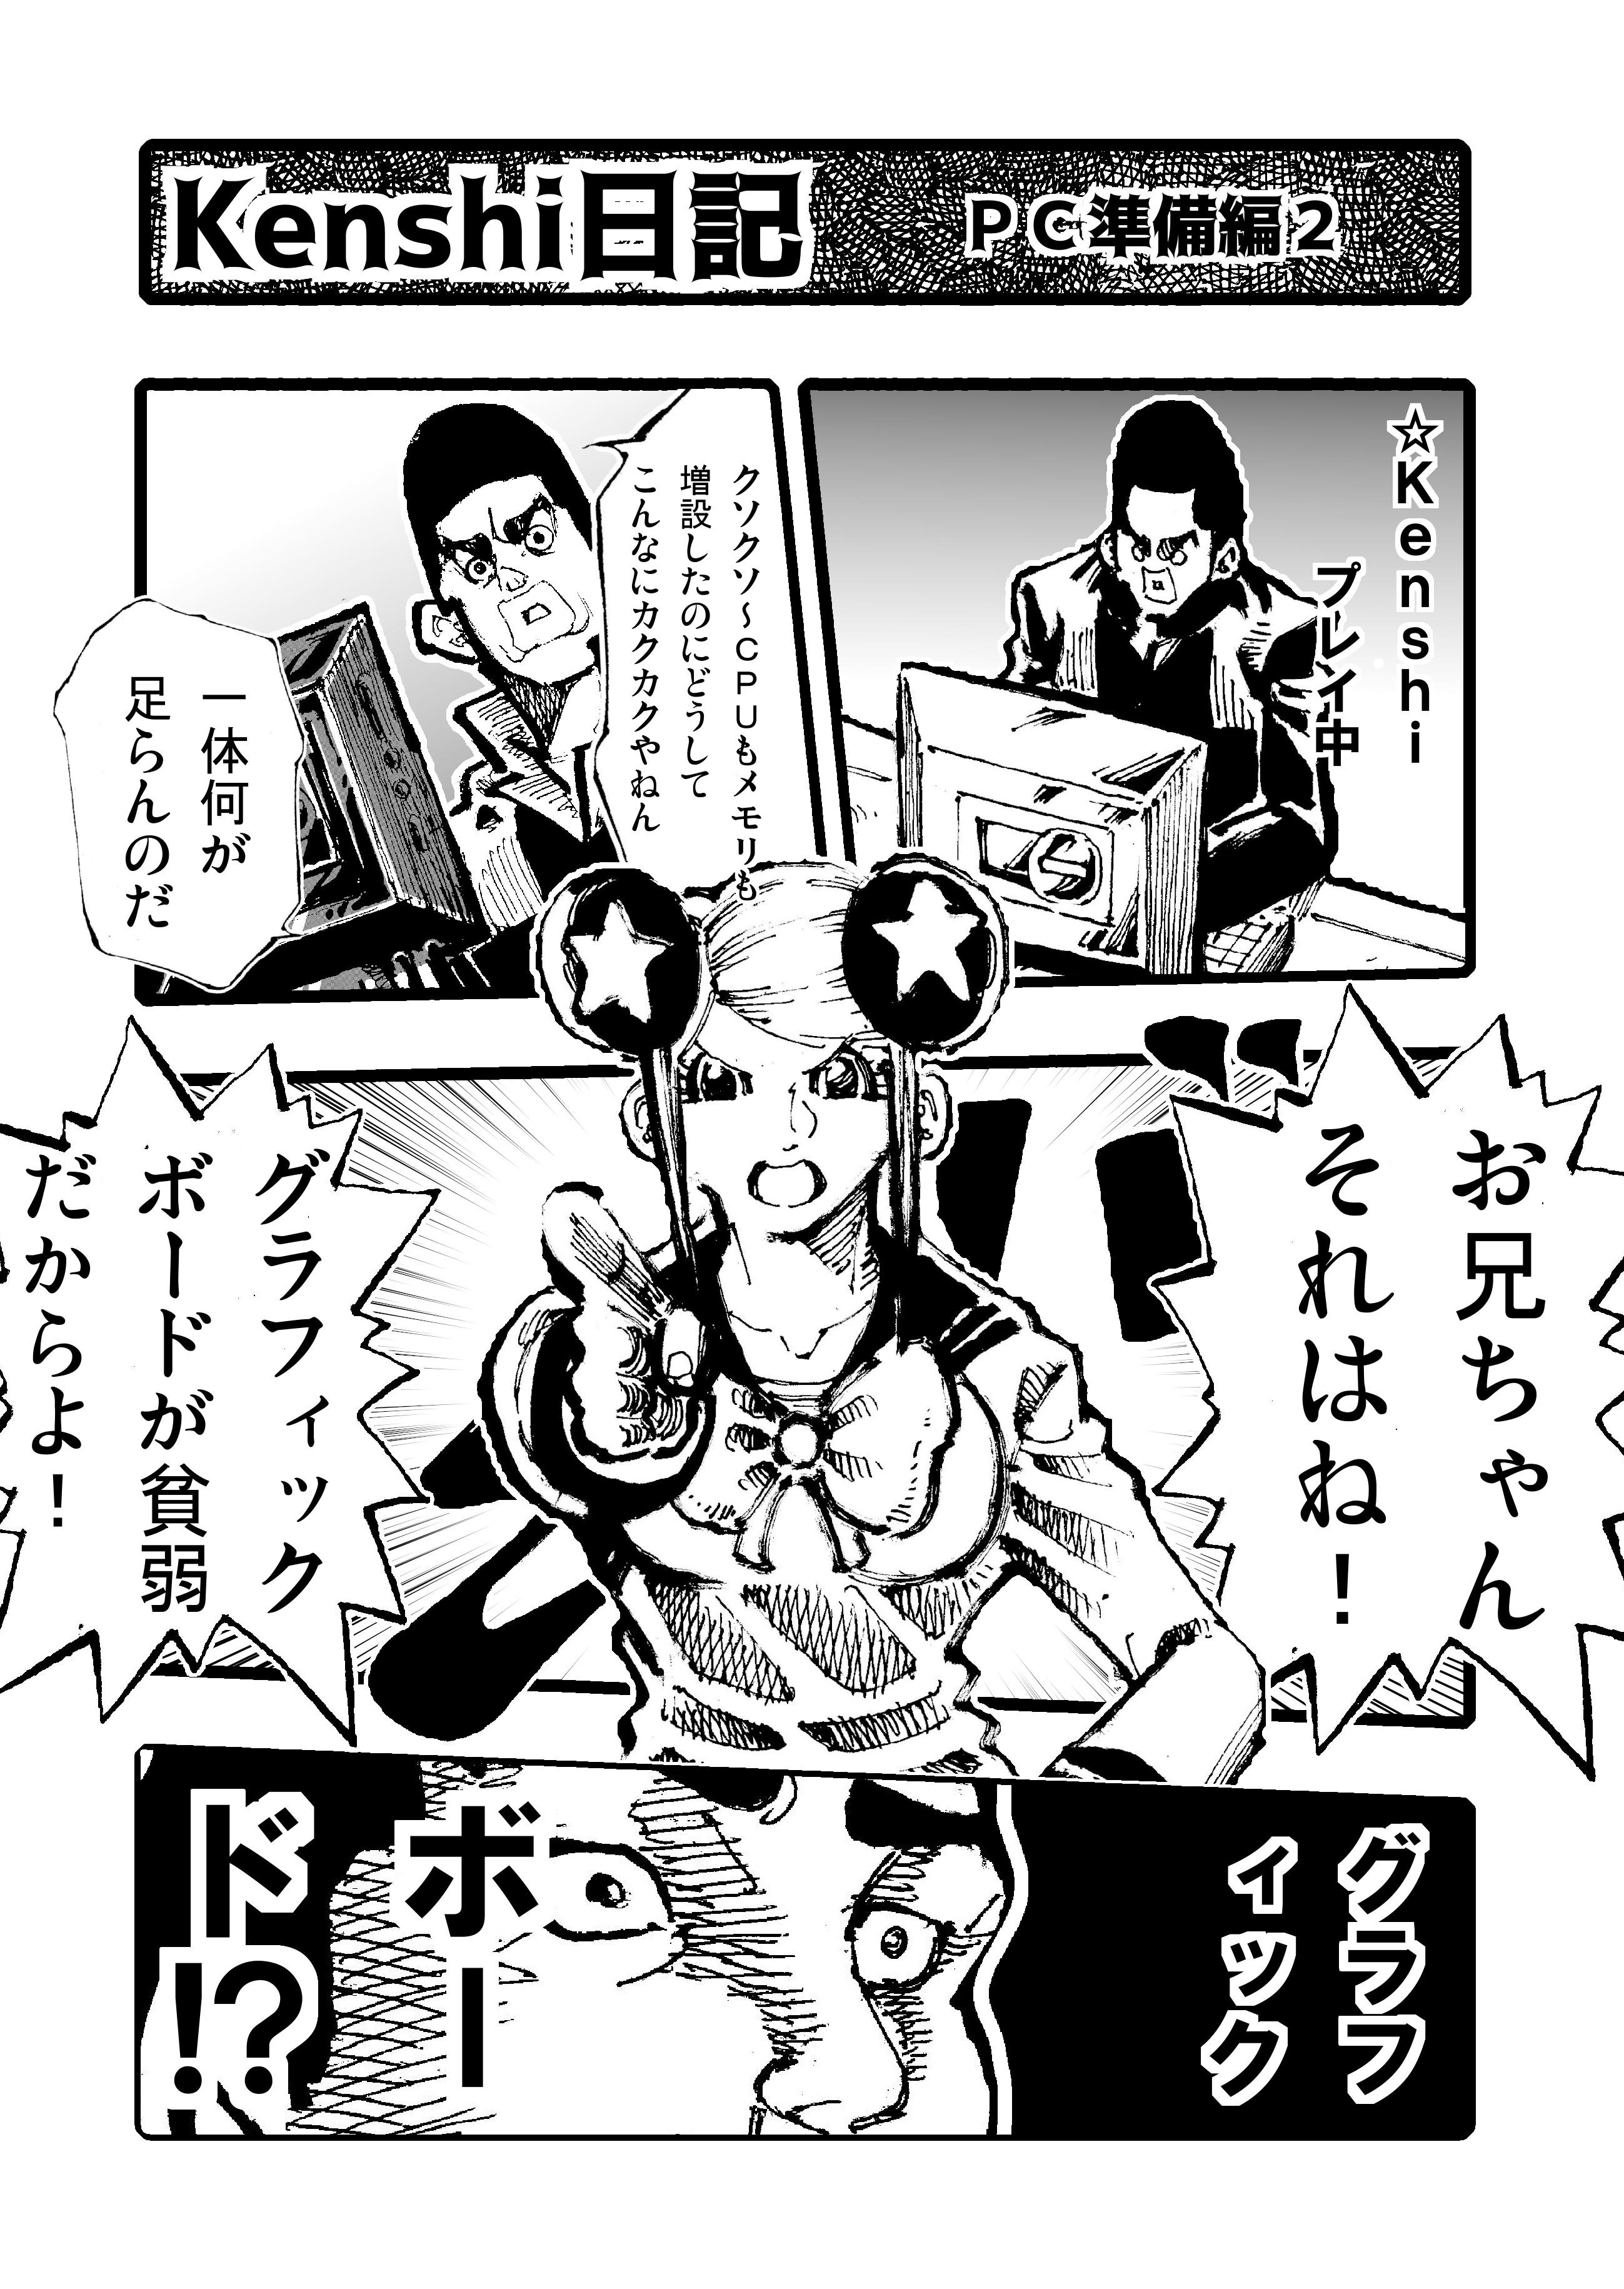 Kenshi日記0 PC準備編2